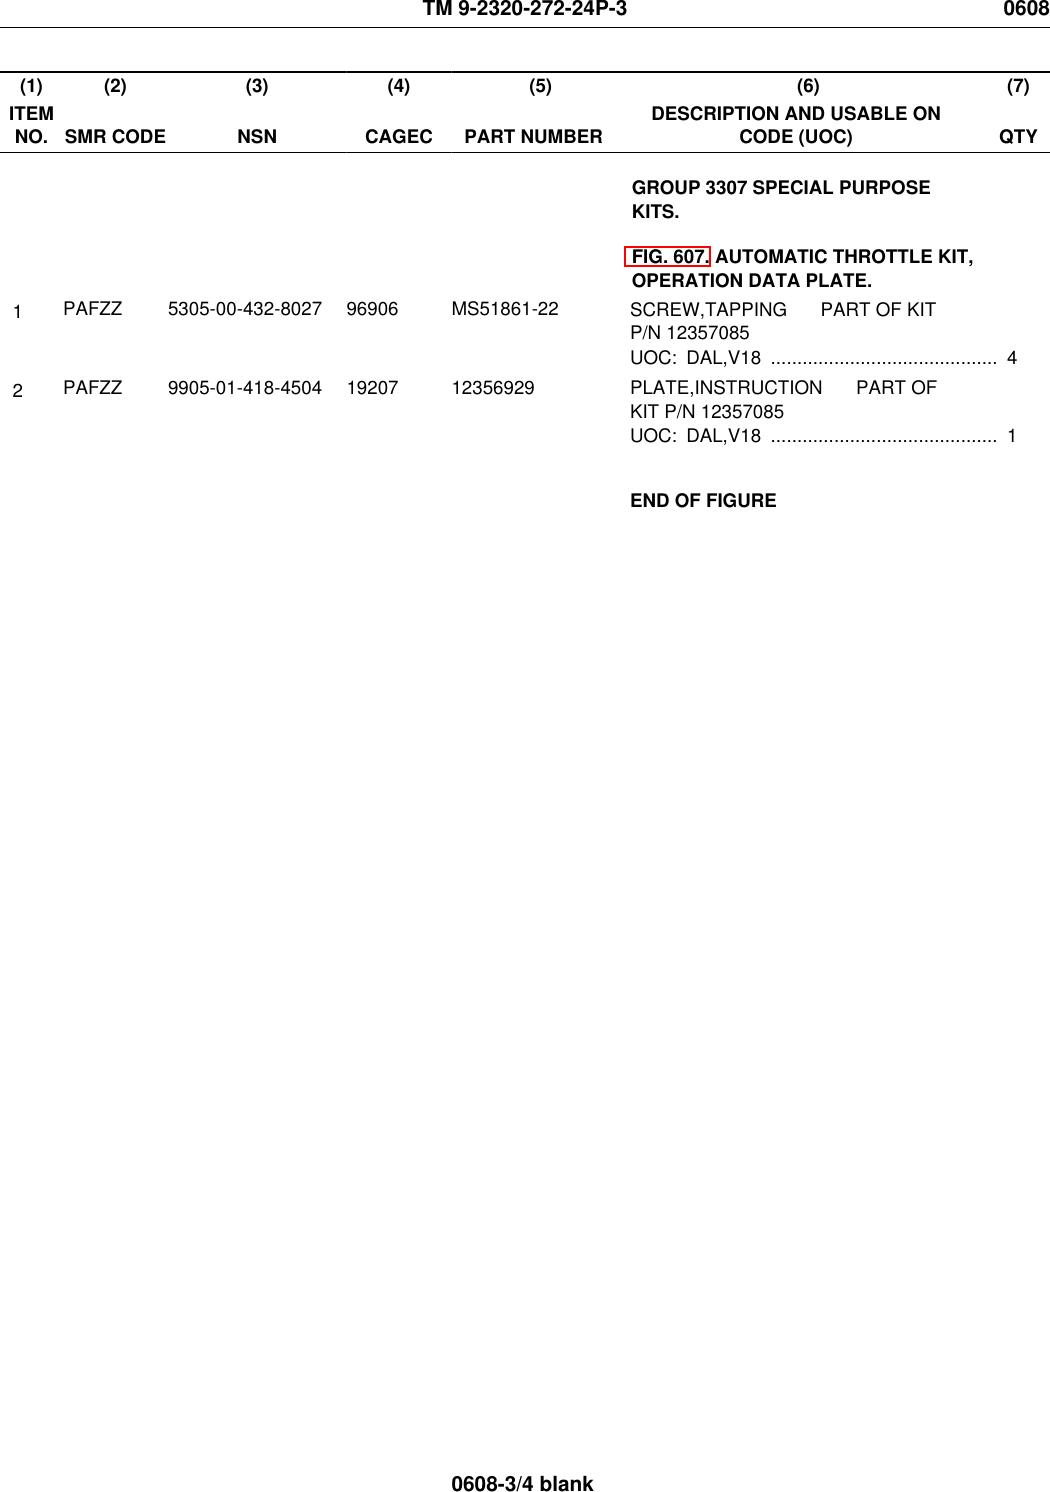 DIESEL MILITARY 12301495 4820-01 M939 SERIES Fuel Tank Check Valve 5-TON 6 X 6